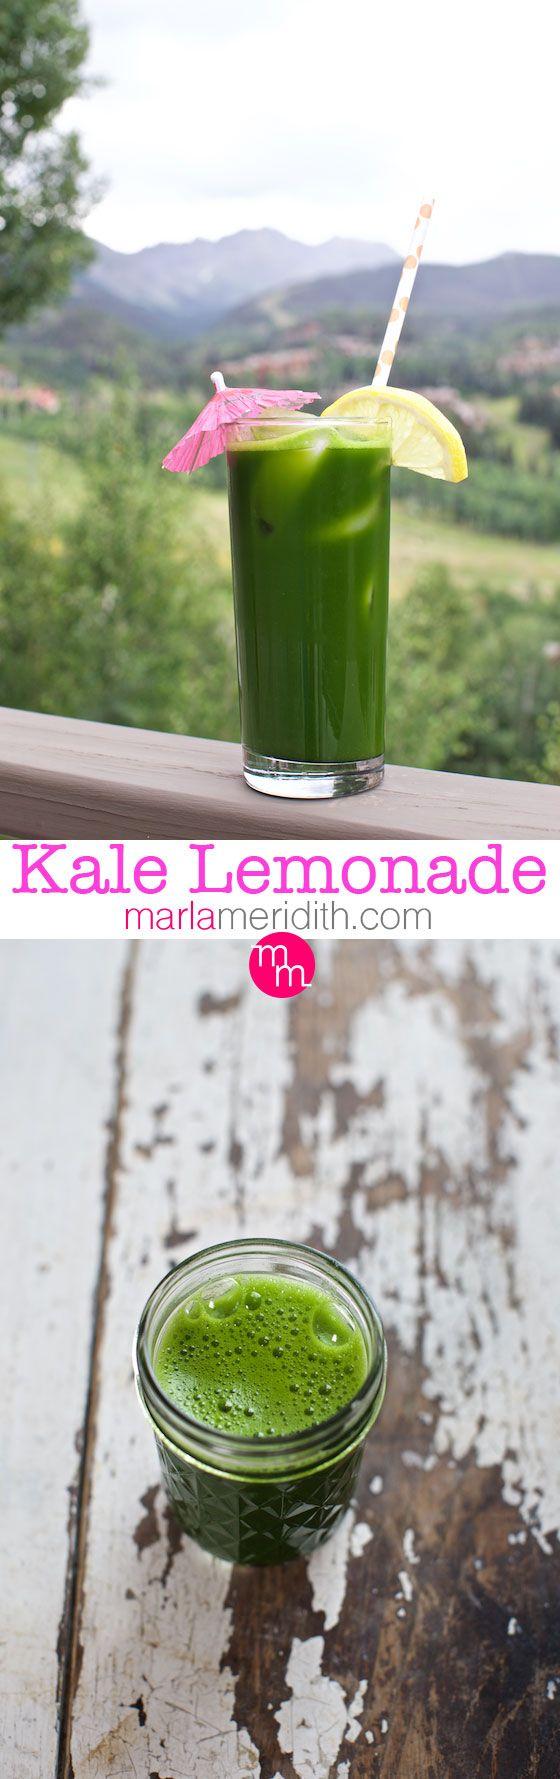 Green Lemonade Juice & Smoothie. The ultimate green drink! MarlaMeridith.com ( @marlameridith )